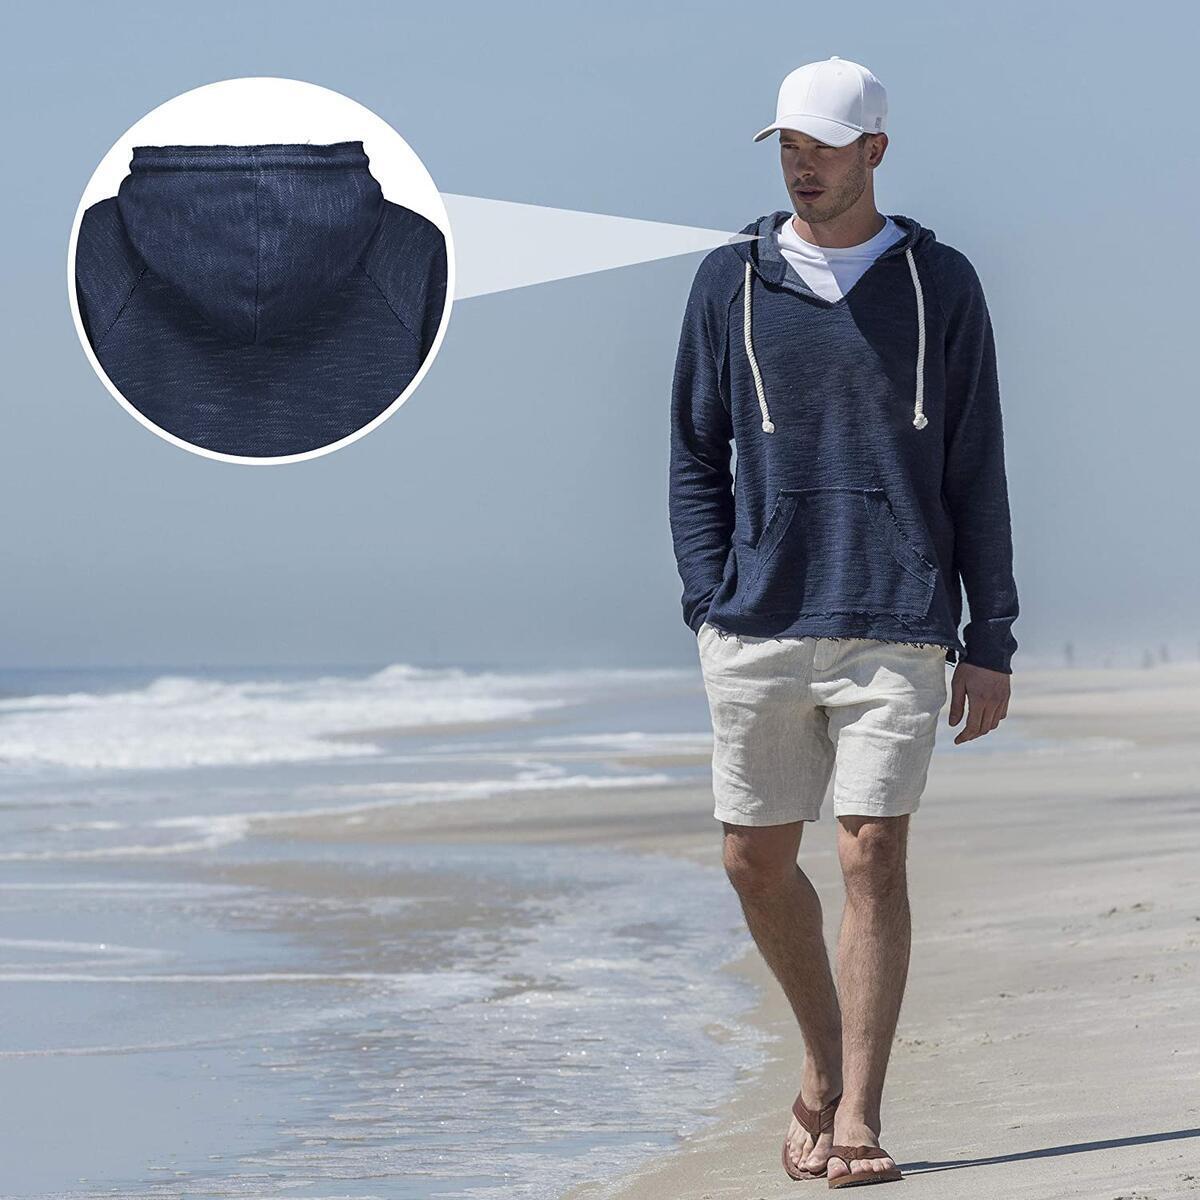 MV Sport Baja Hoodie Men (Lightweight Pullover Hoodie Men) Summer Hoodies for Men - All Colors and Sizes